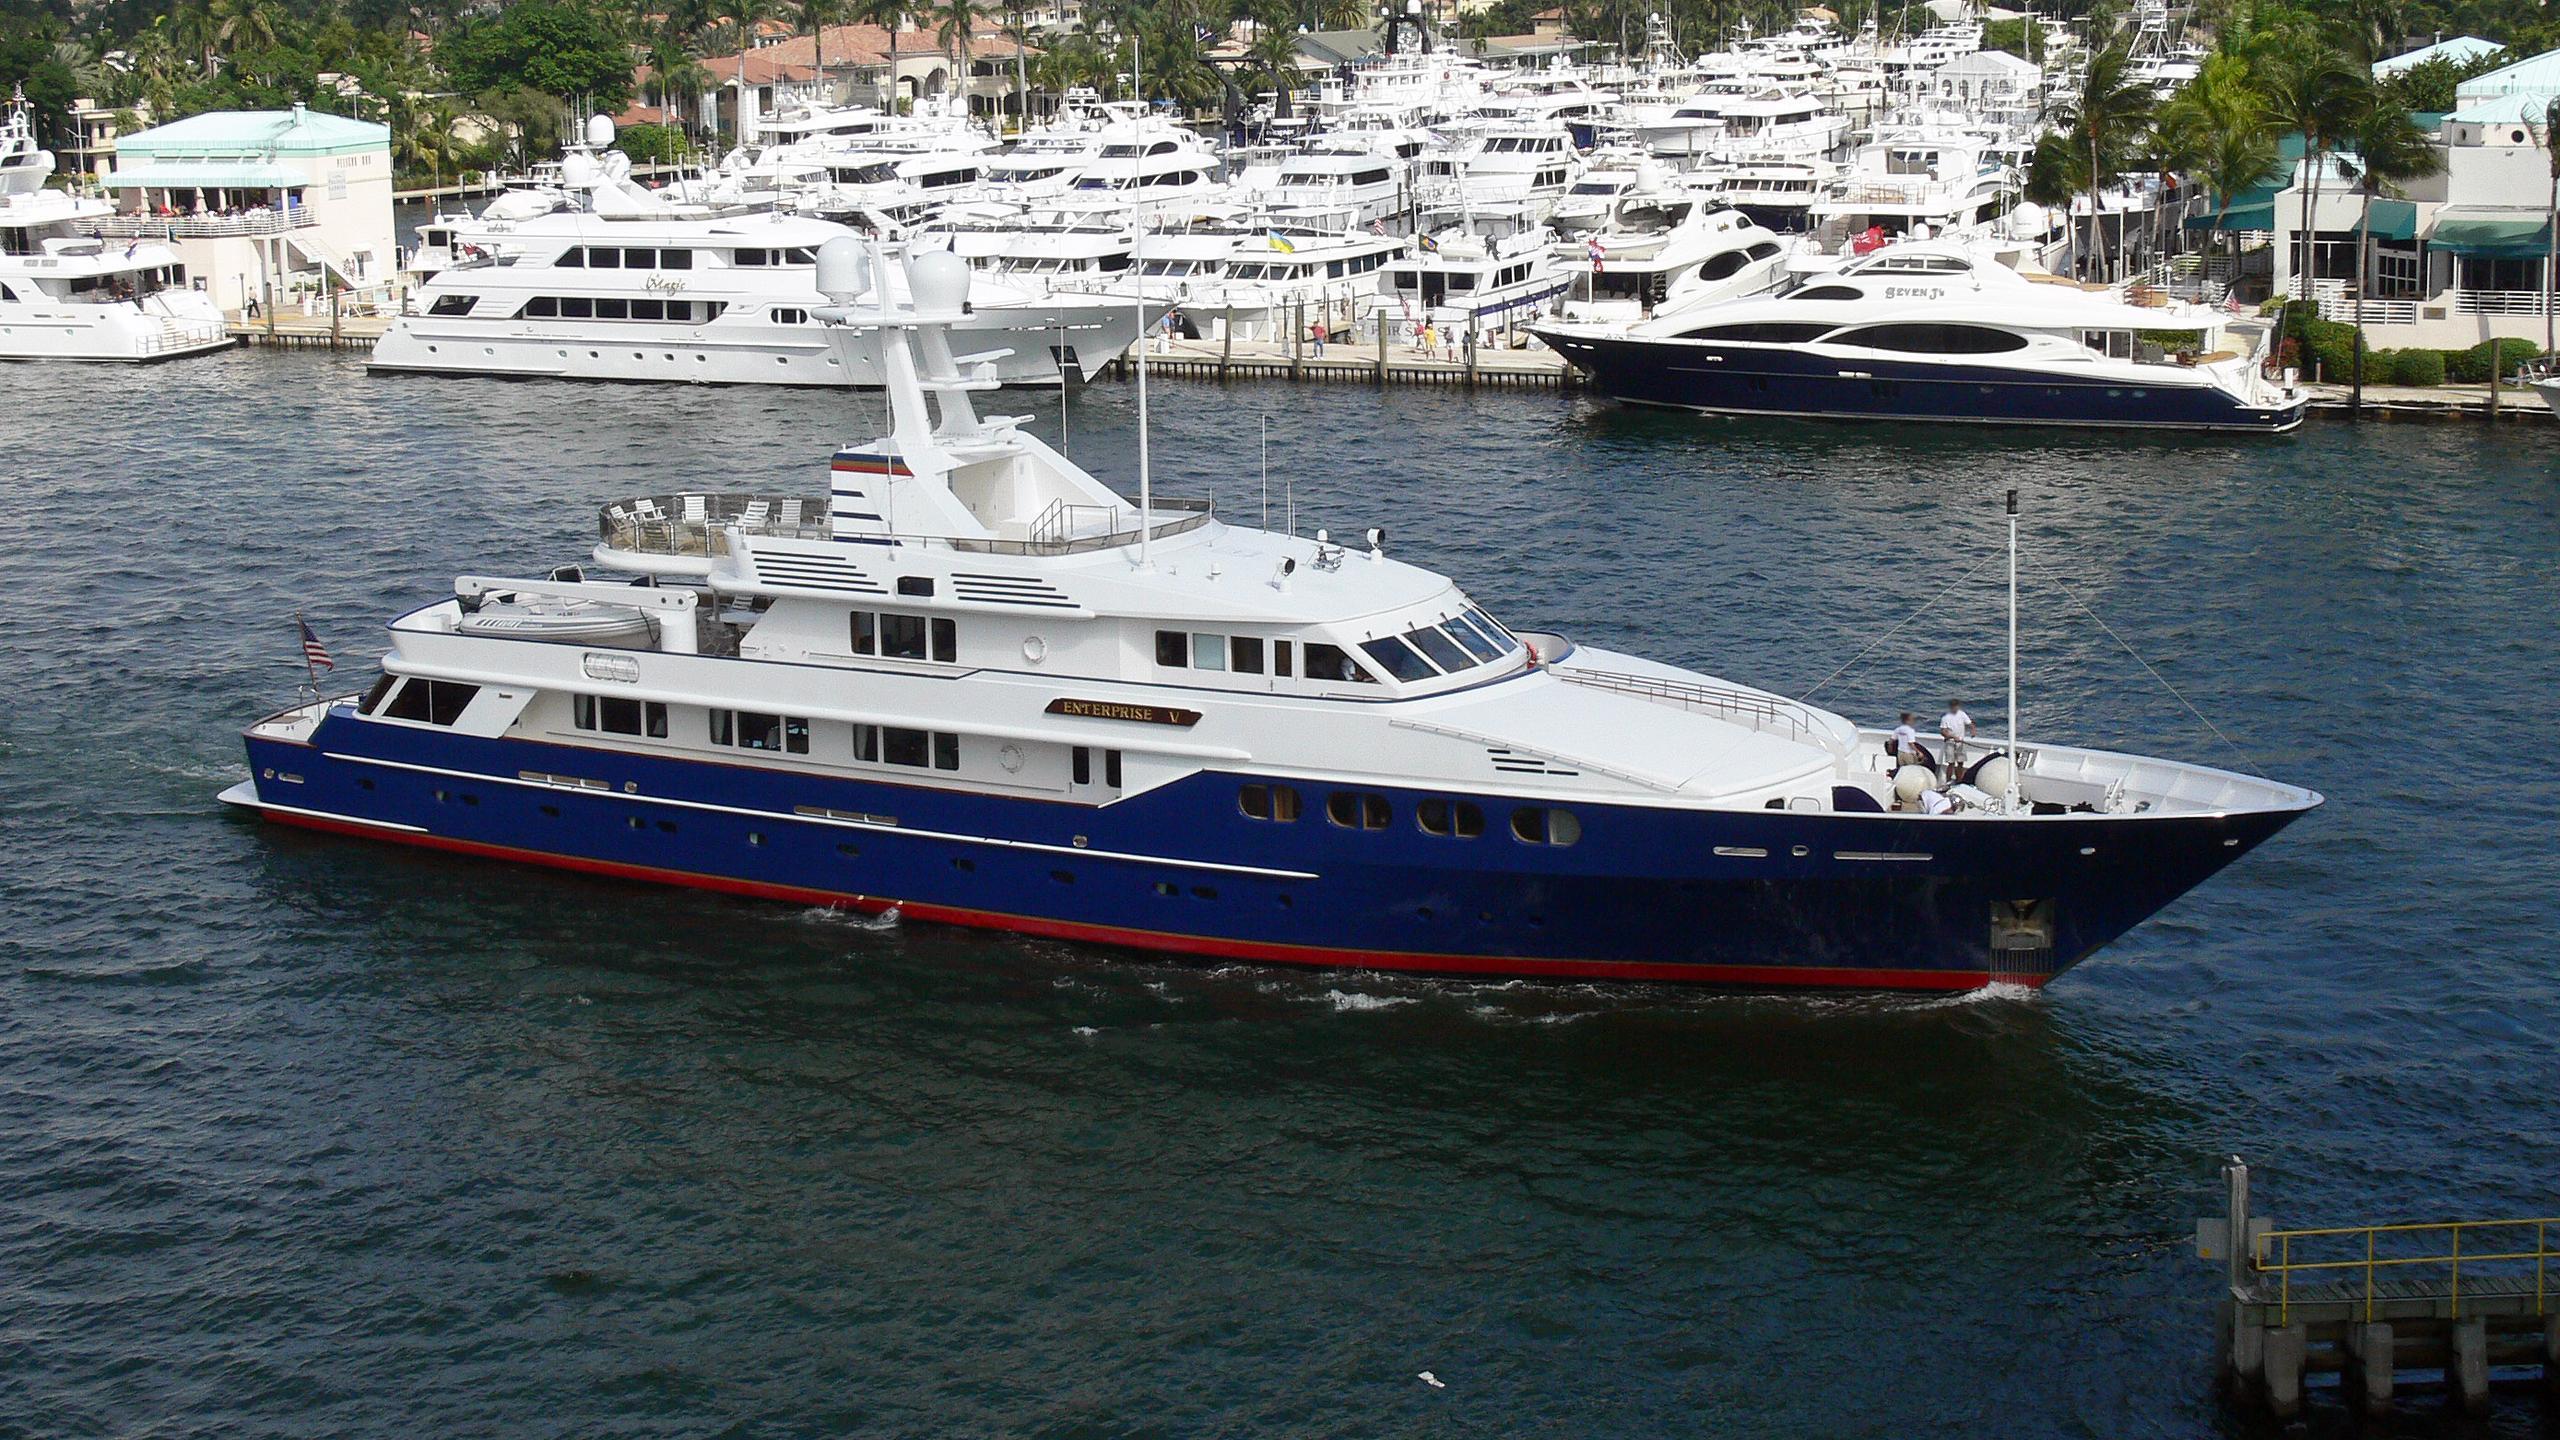 chantal-ma-vie-motor-yacht-feadship-1993-51m-profile